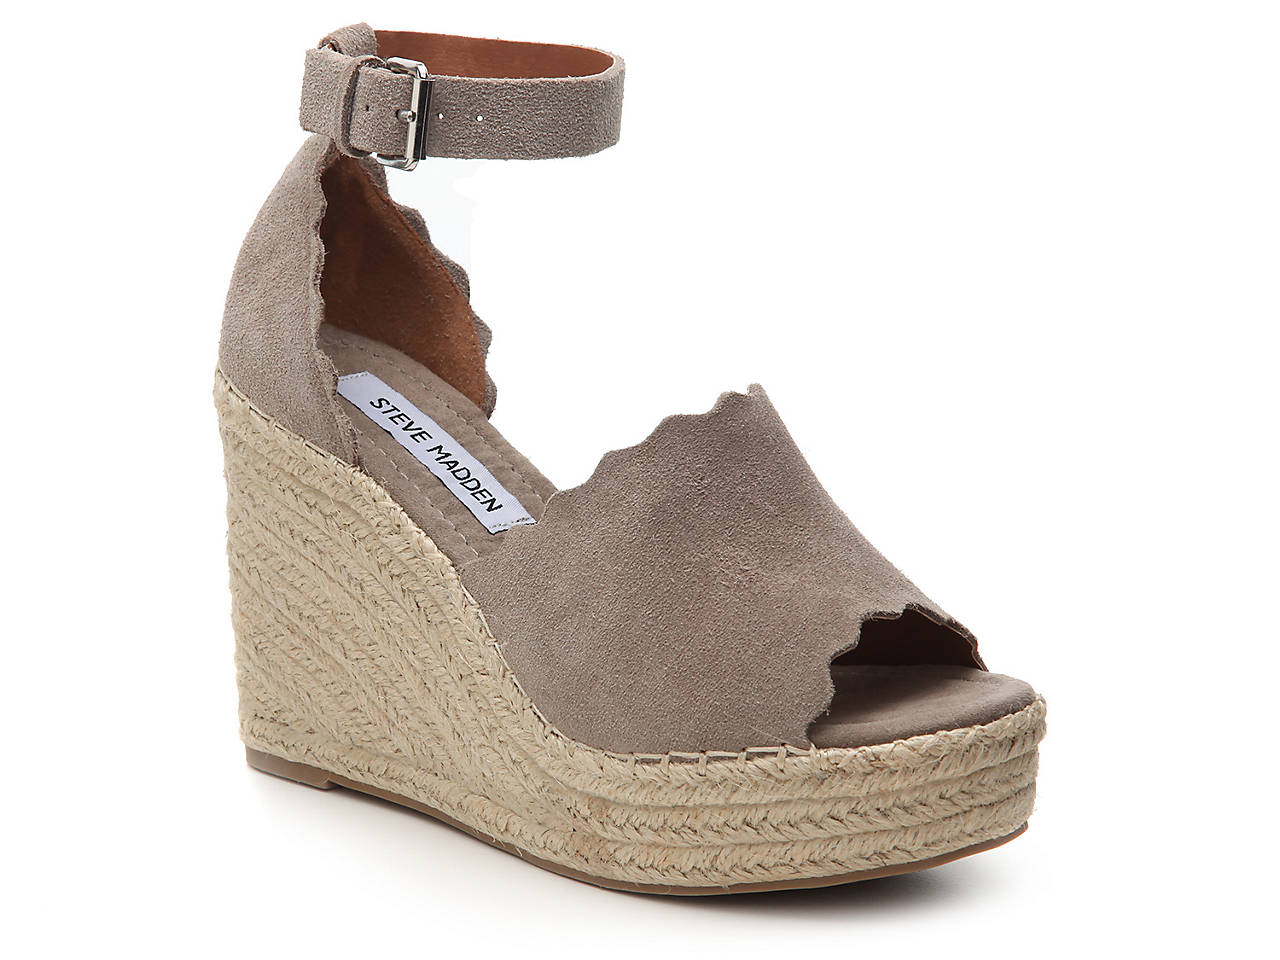 dbb7b19ef5d Steve Madden Reegin Espadrille Wedge Sandal Women s Shoes